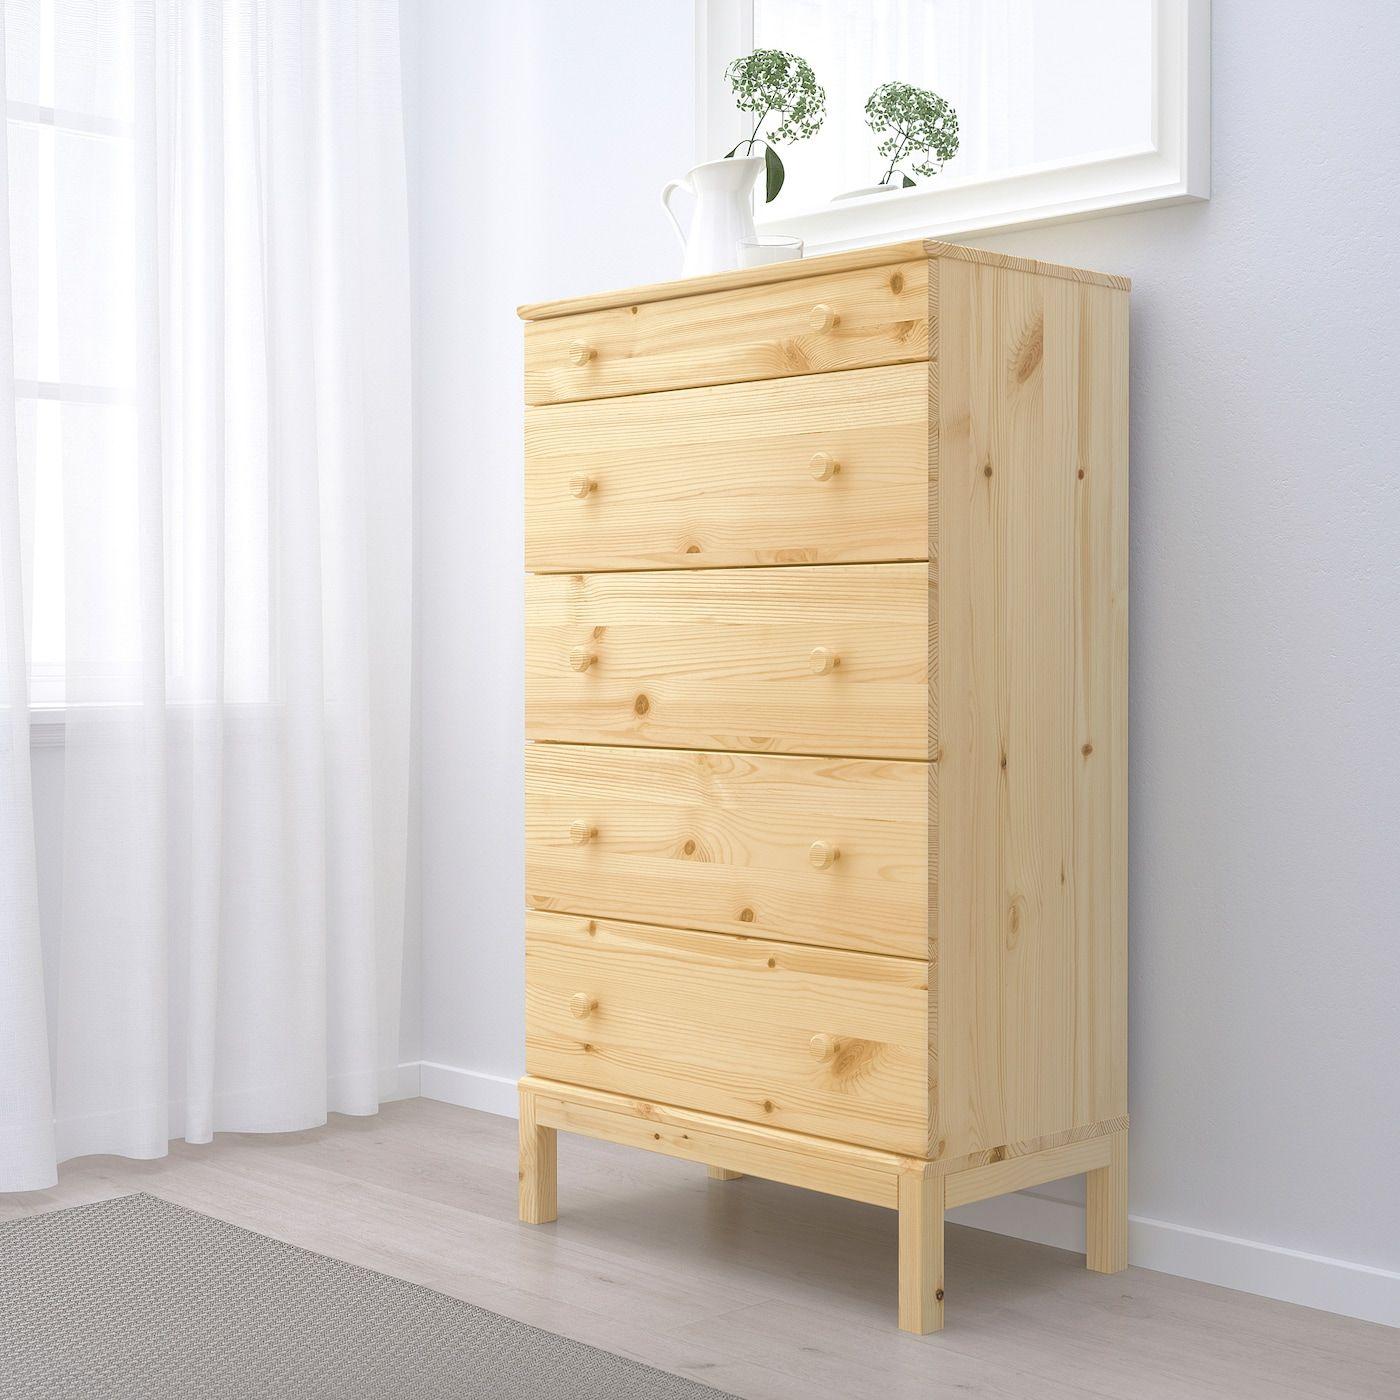 Tarva 5 Drawer Chest Pine 29 7 8x50 Ikea 5 Drawer Chest Creative Furniture Remodel Bedroom [ 1400 x 1400 Pixel ]